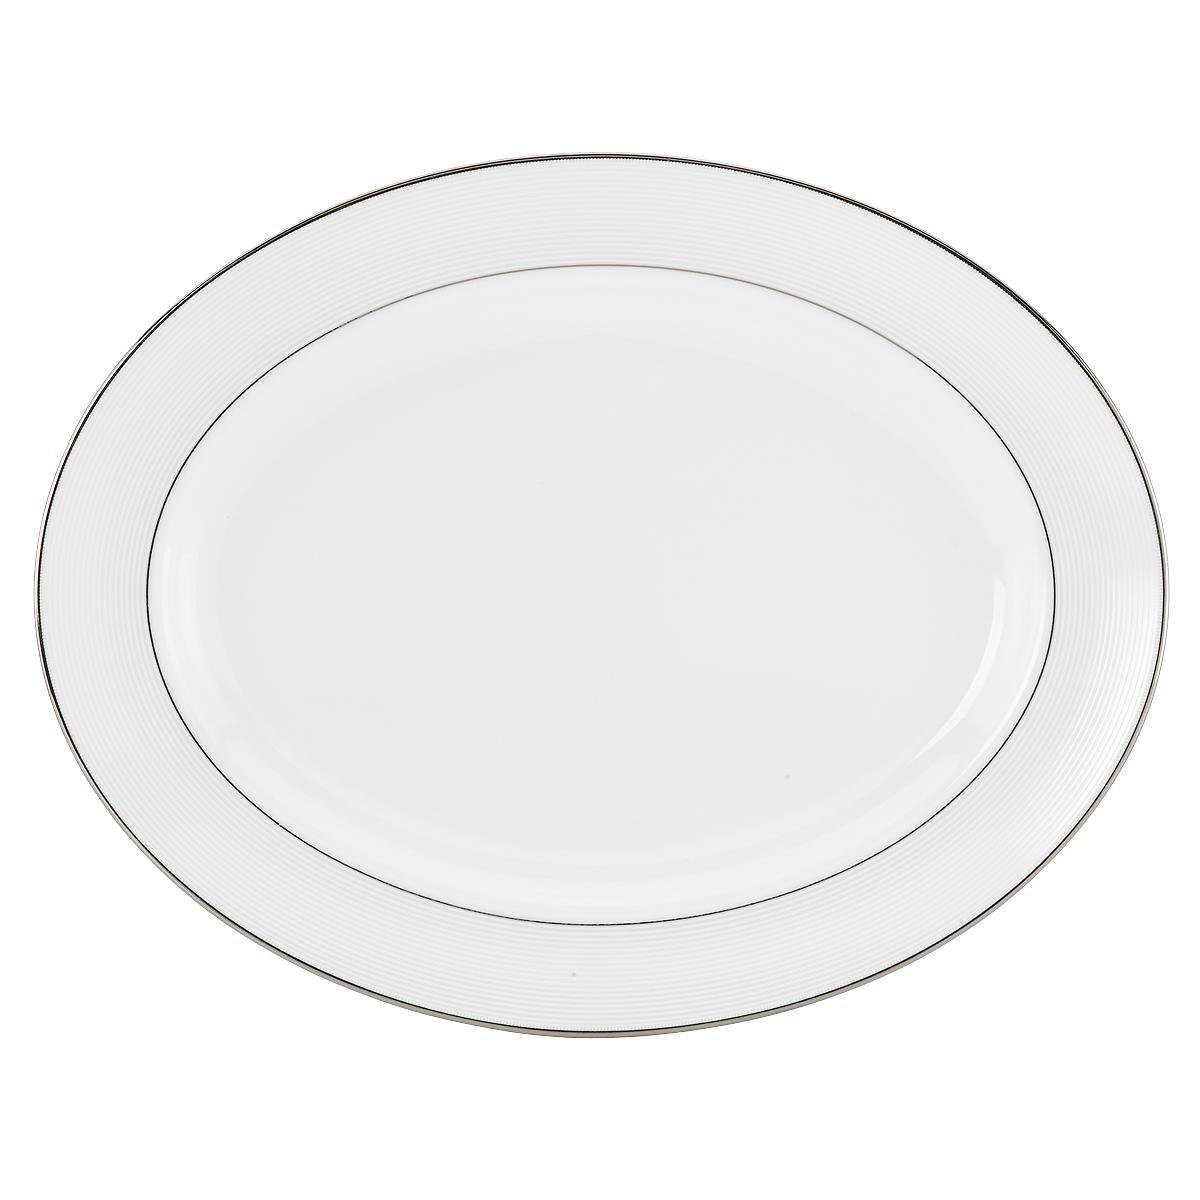 Lenox Opal Innocence Stripe 3-Piece Place Setting, White 853814